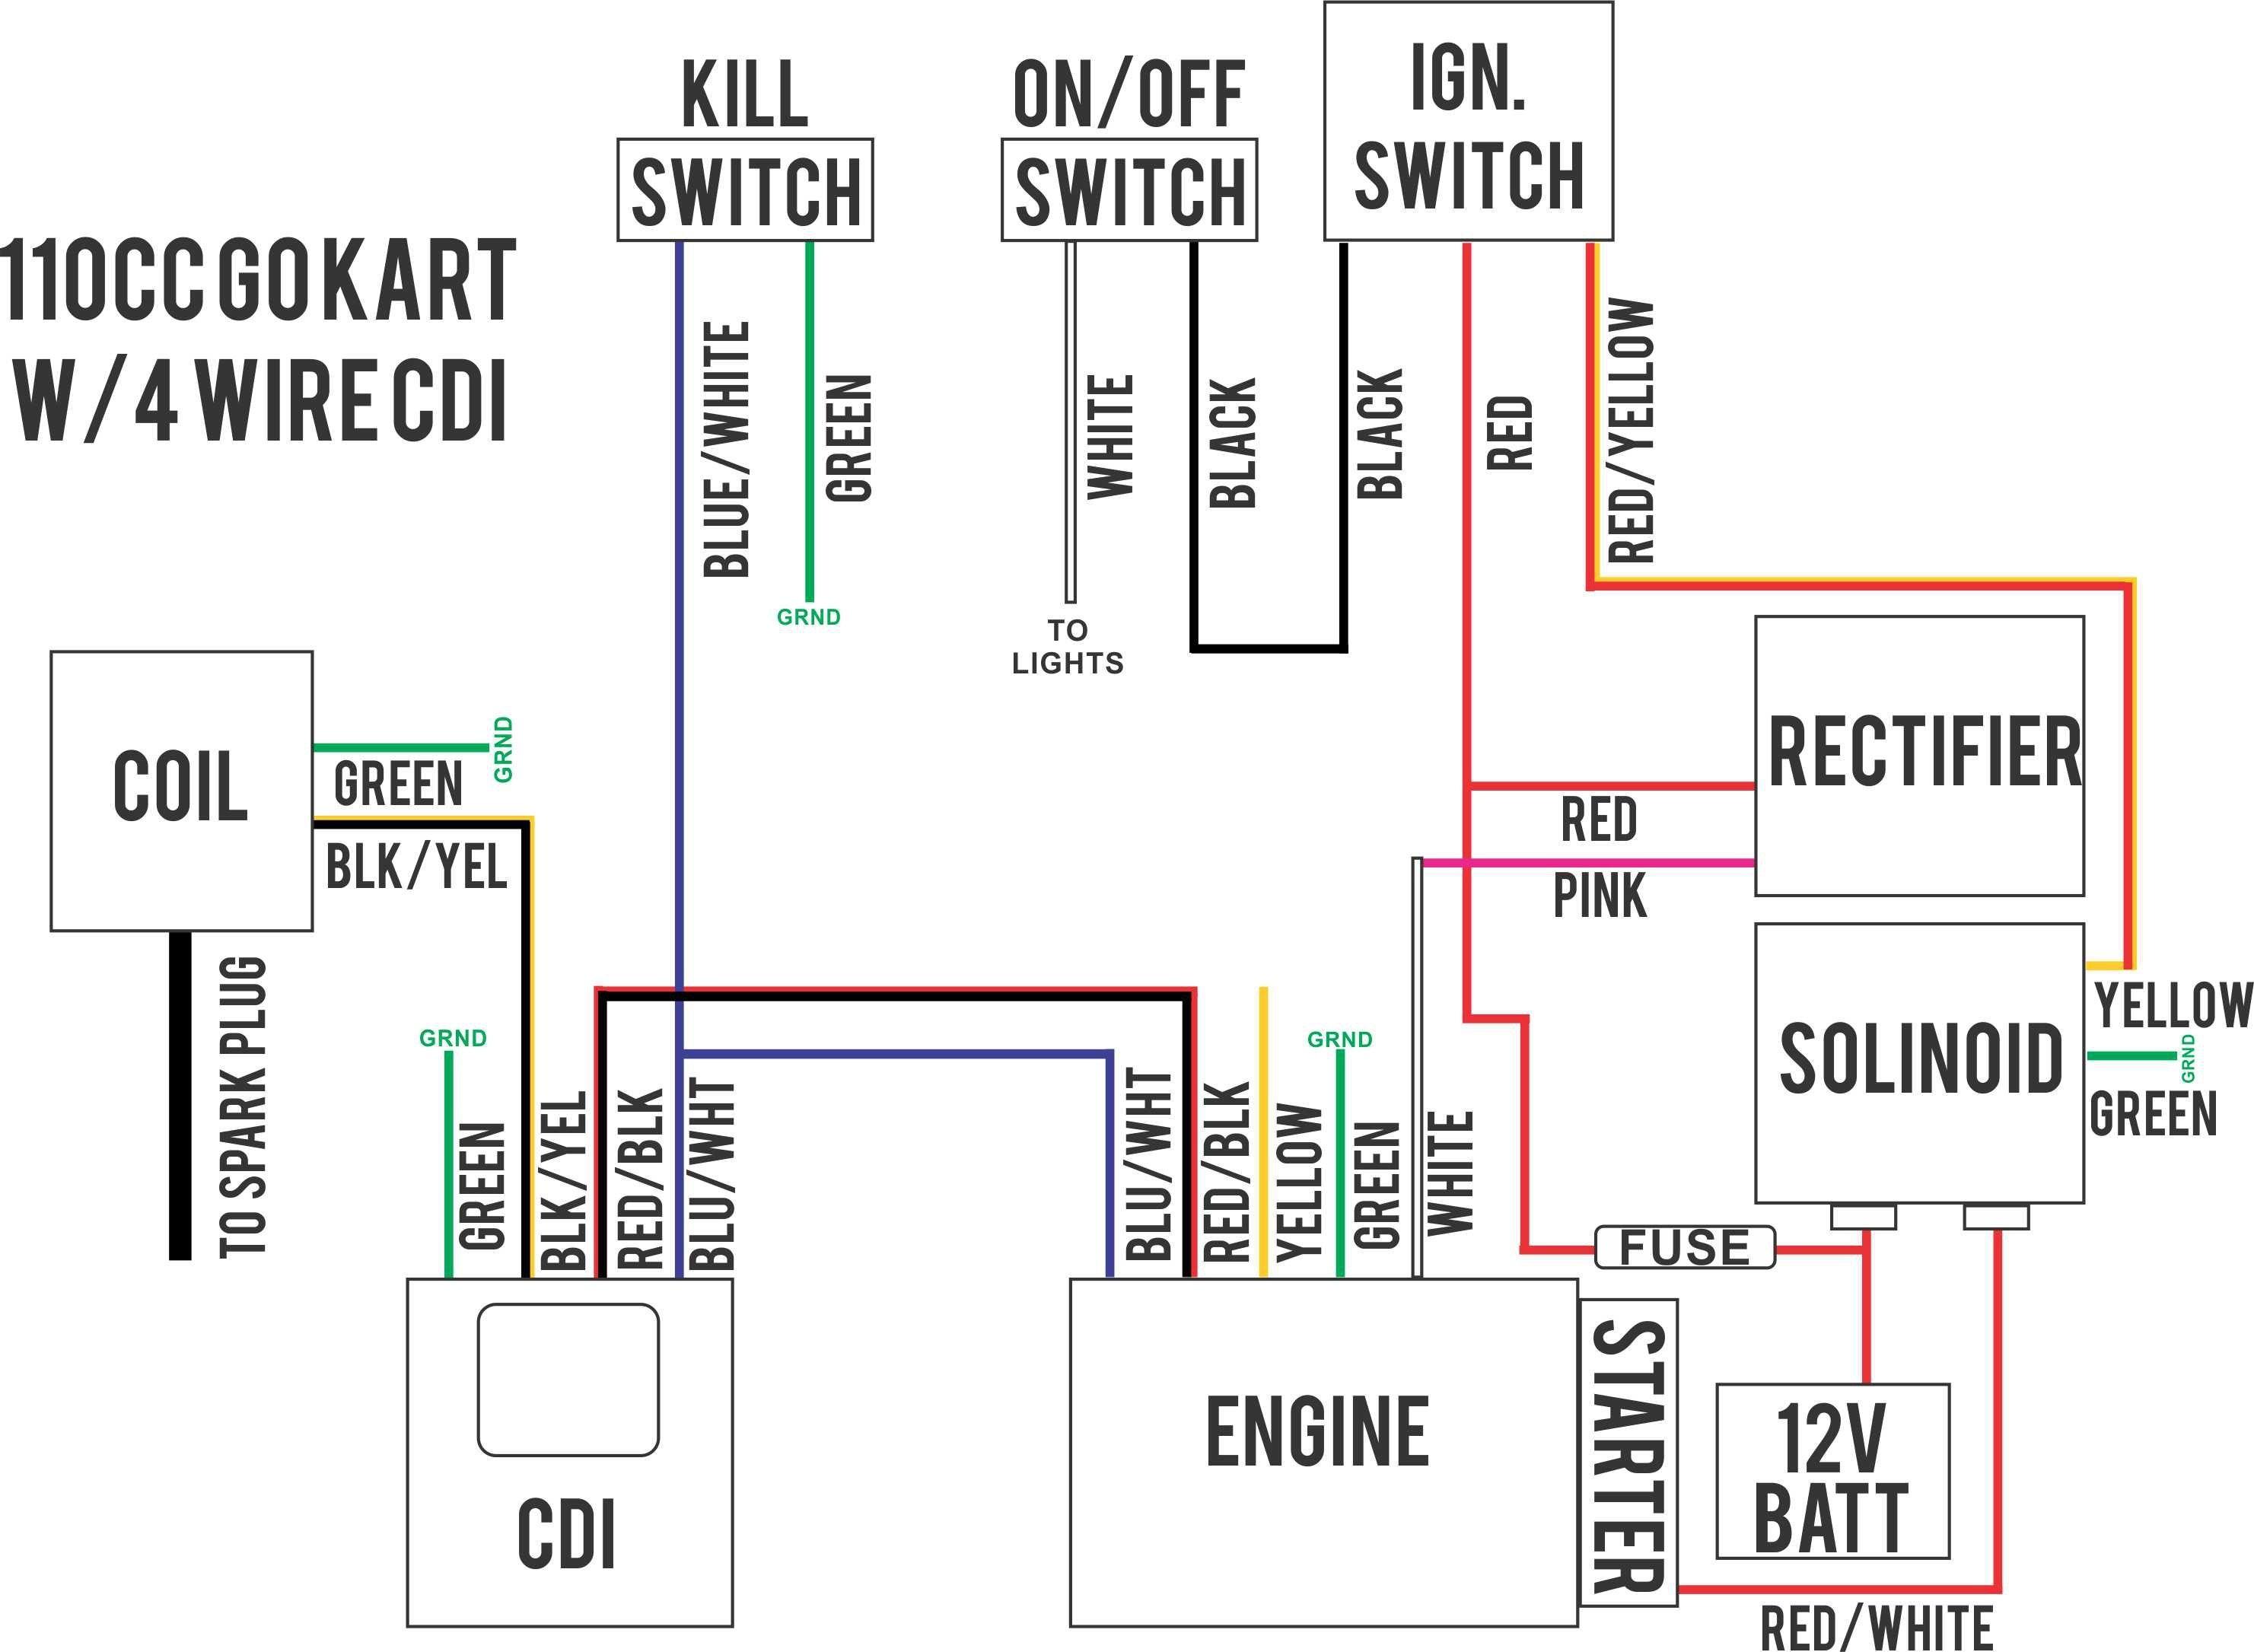 DIAGRAM] Sunl 49cc E22 5 Pin Cdi Wiring Diagram FULL Version HD Quality Wiring  Diagram - GOLDENRATIOIPHONE.GRANVILLE-NATATION.FRgoldenratioiphone.granville-natation.fr